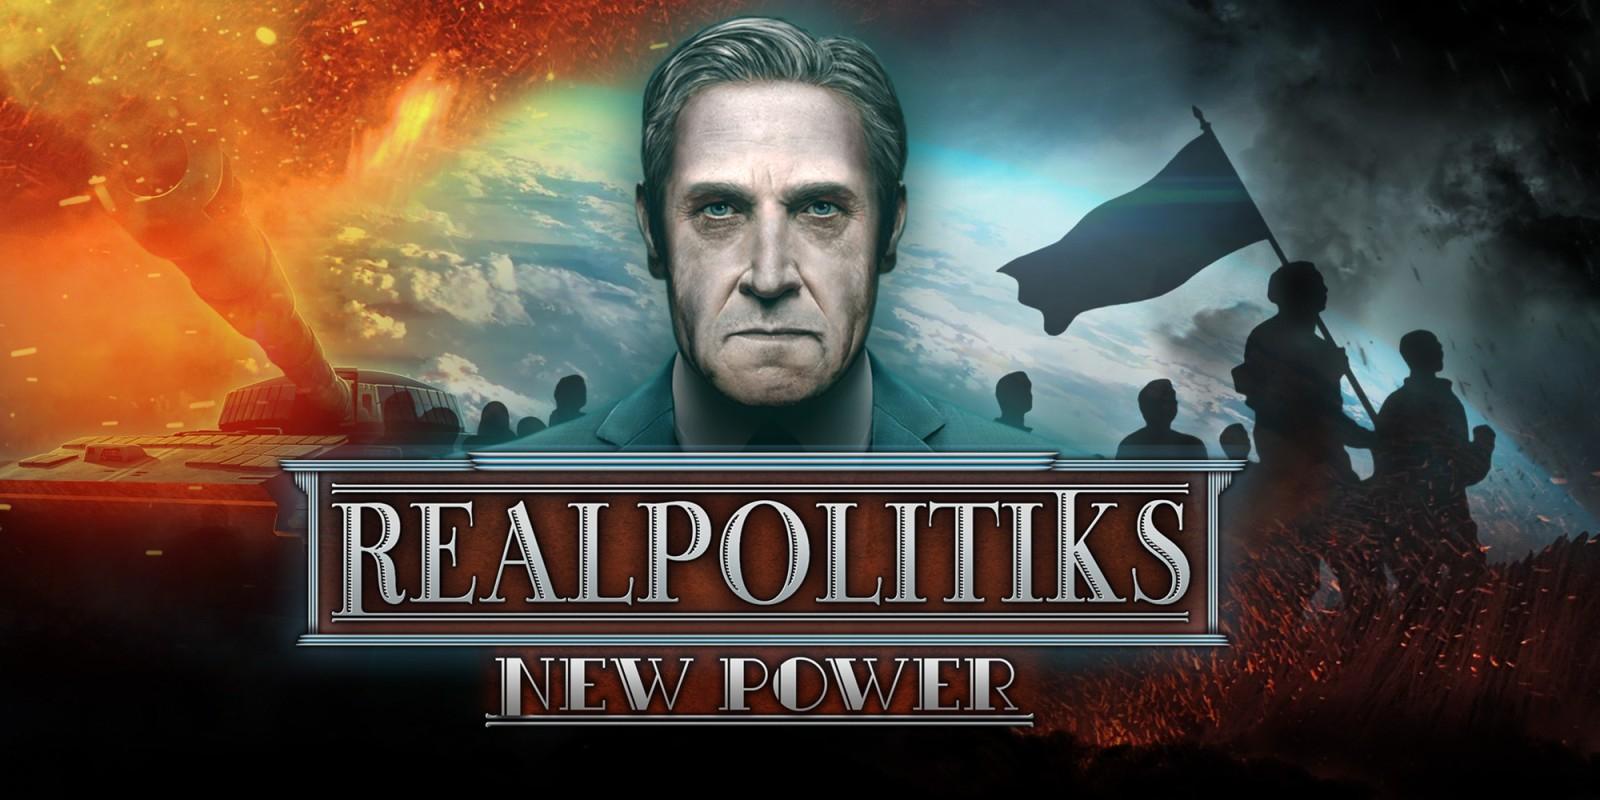 Realpolitiks Nintendo Switch eShop a solo 2.49